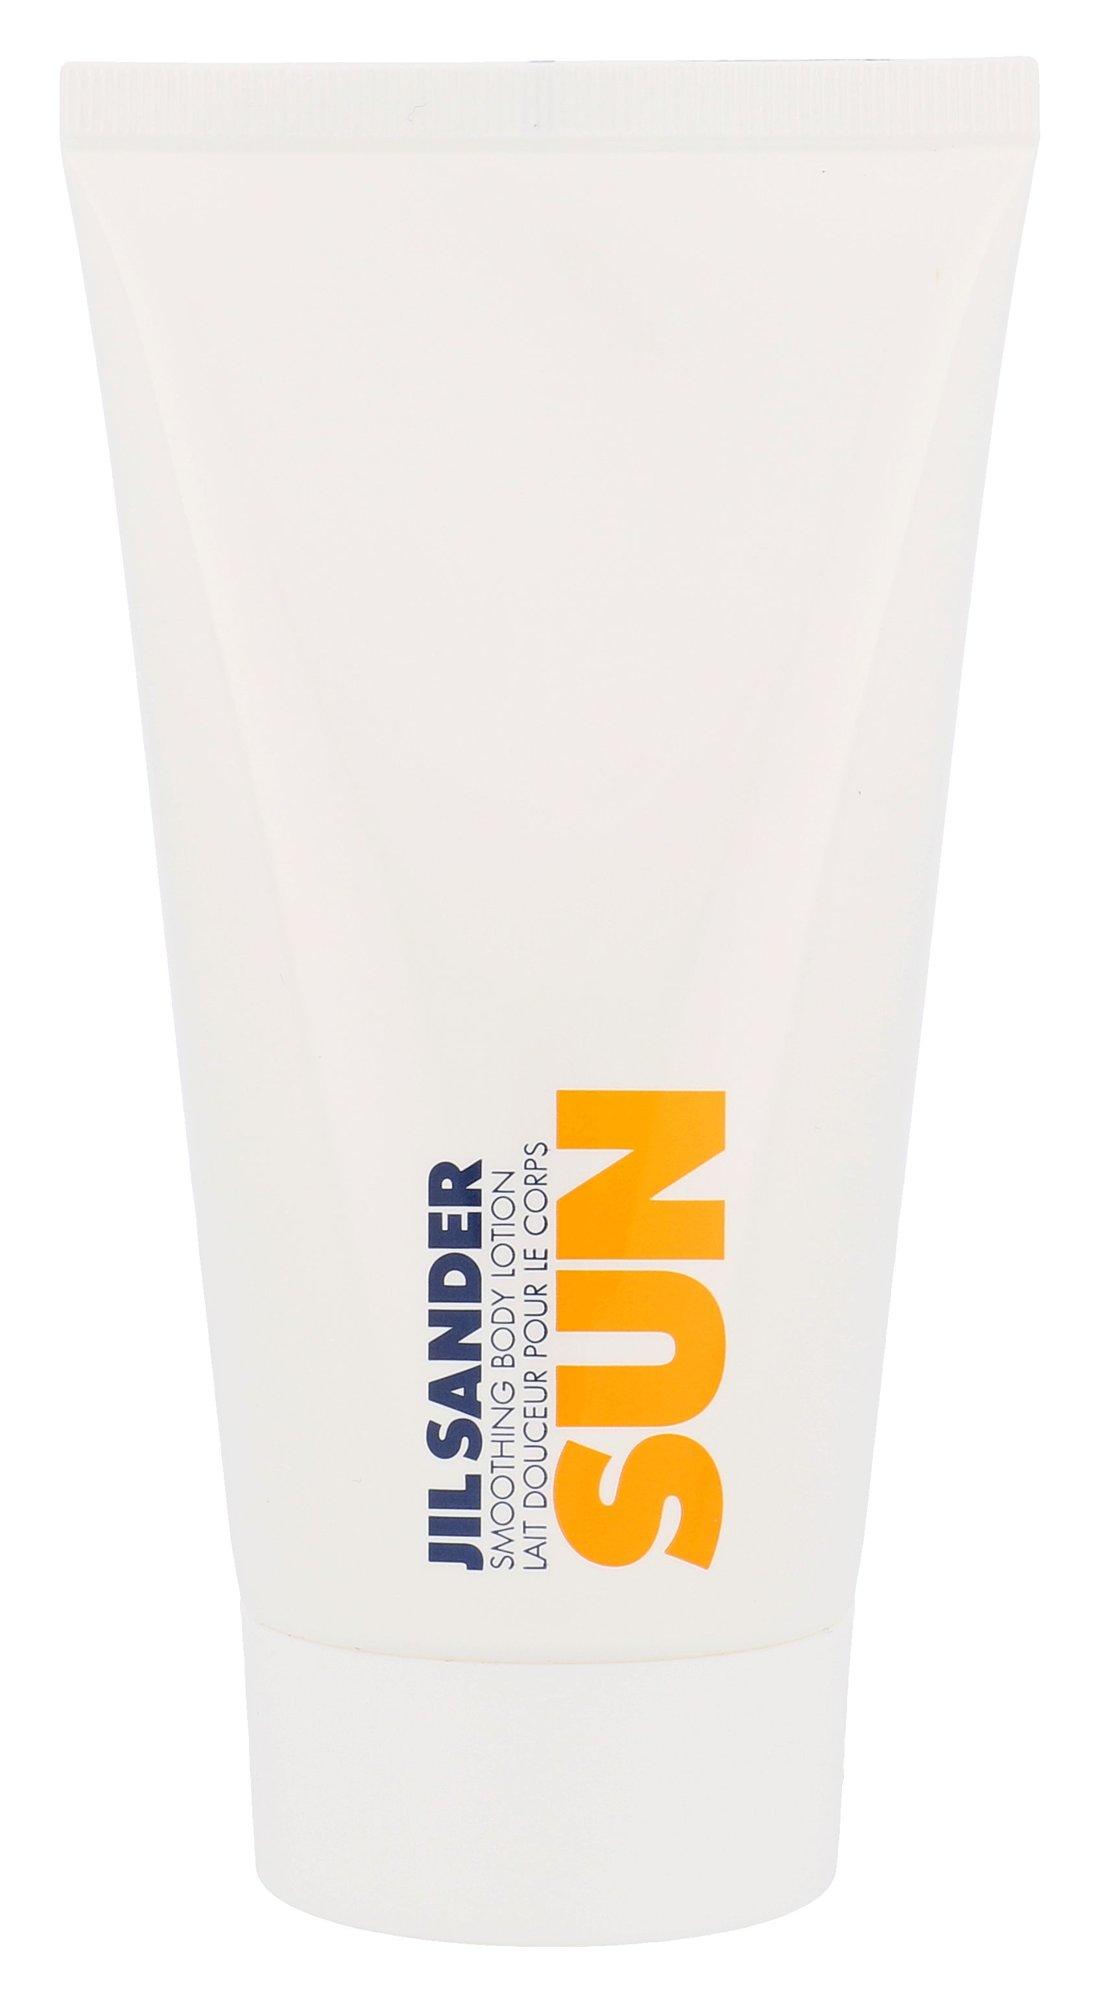 Jil Sander Sun Body lotion 150ml